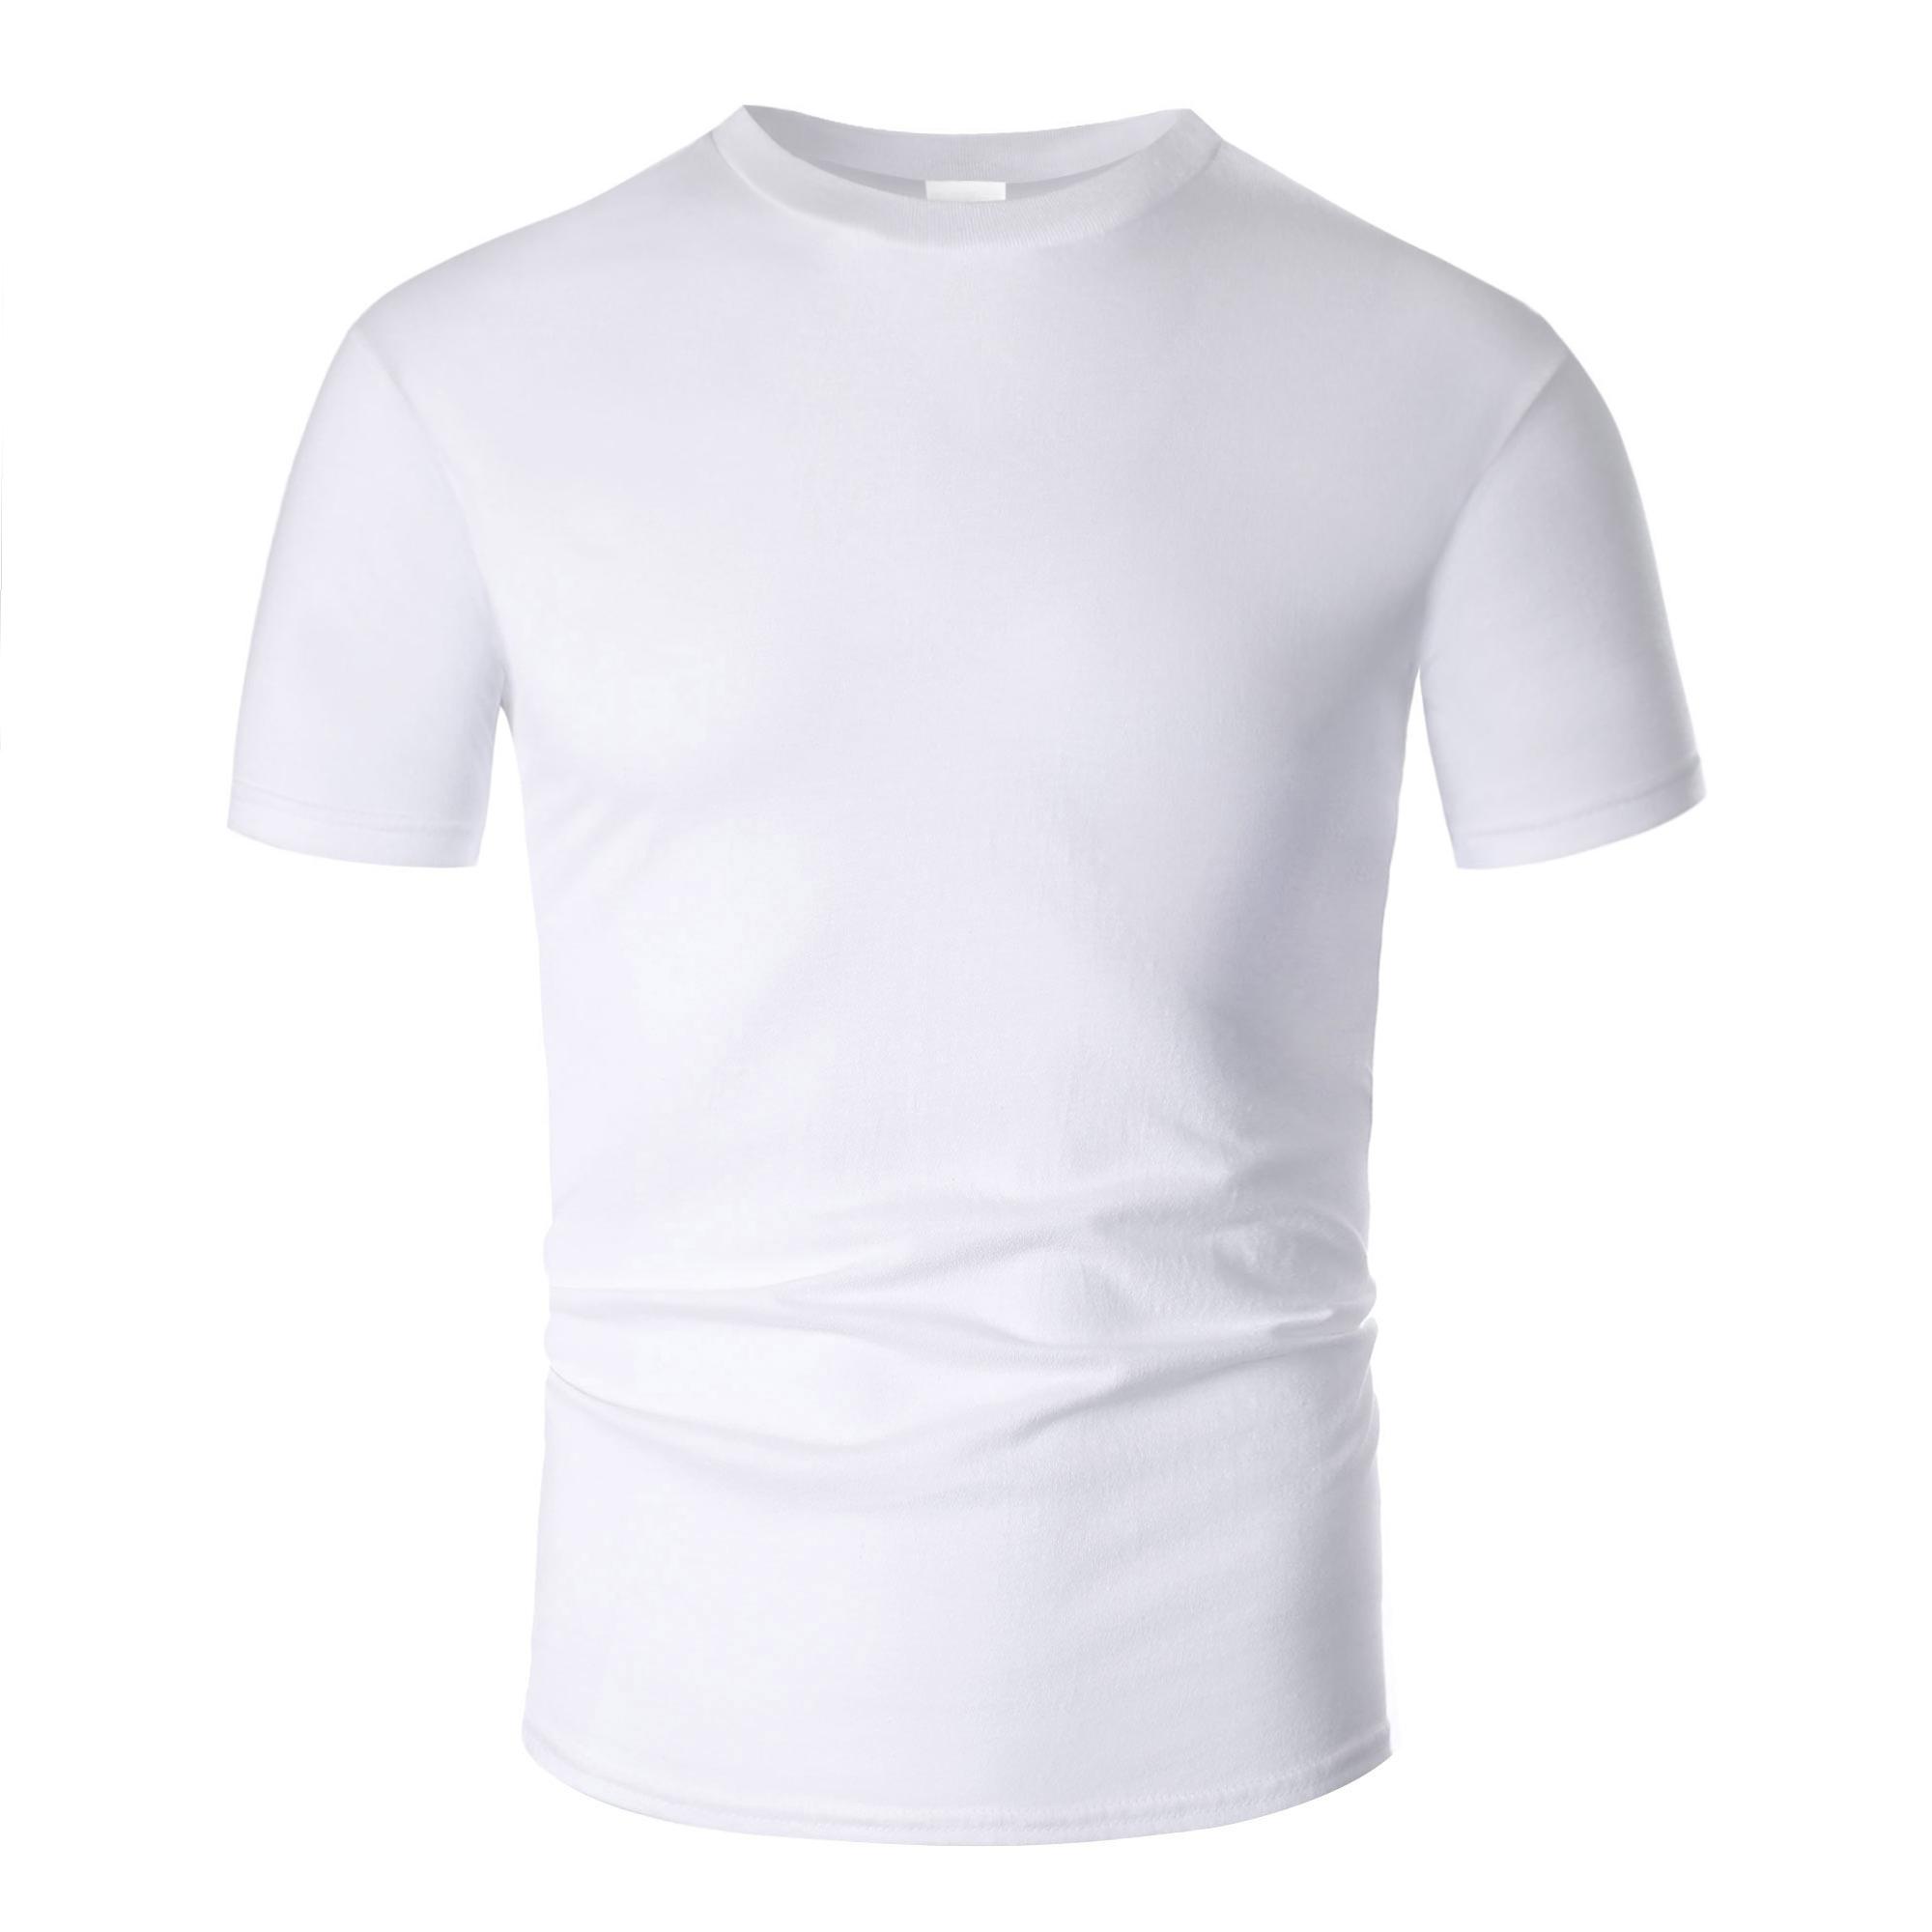 white no logo